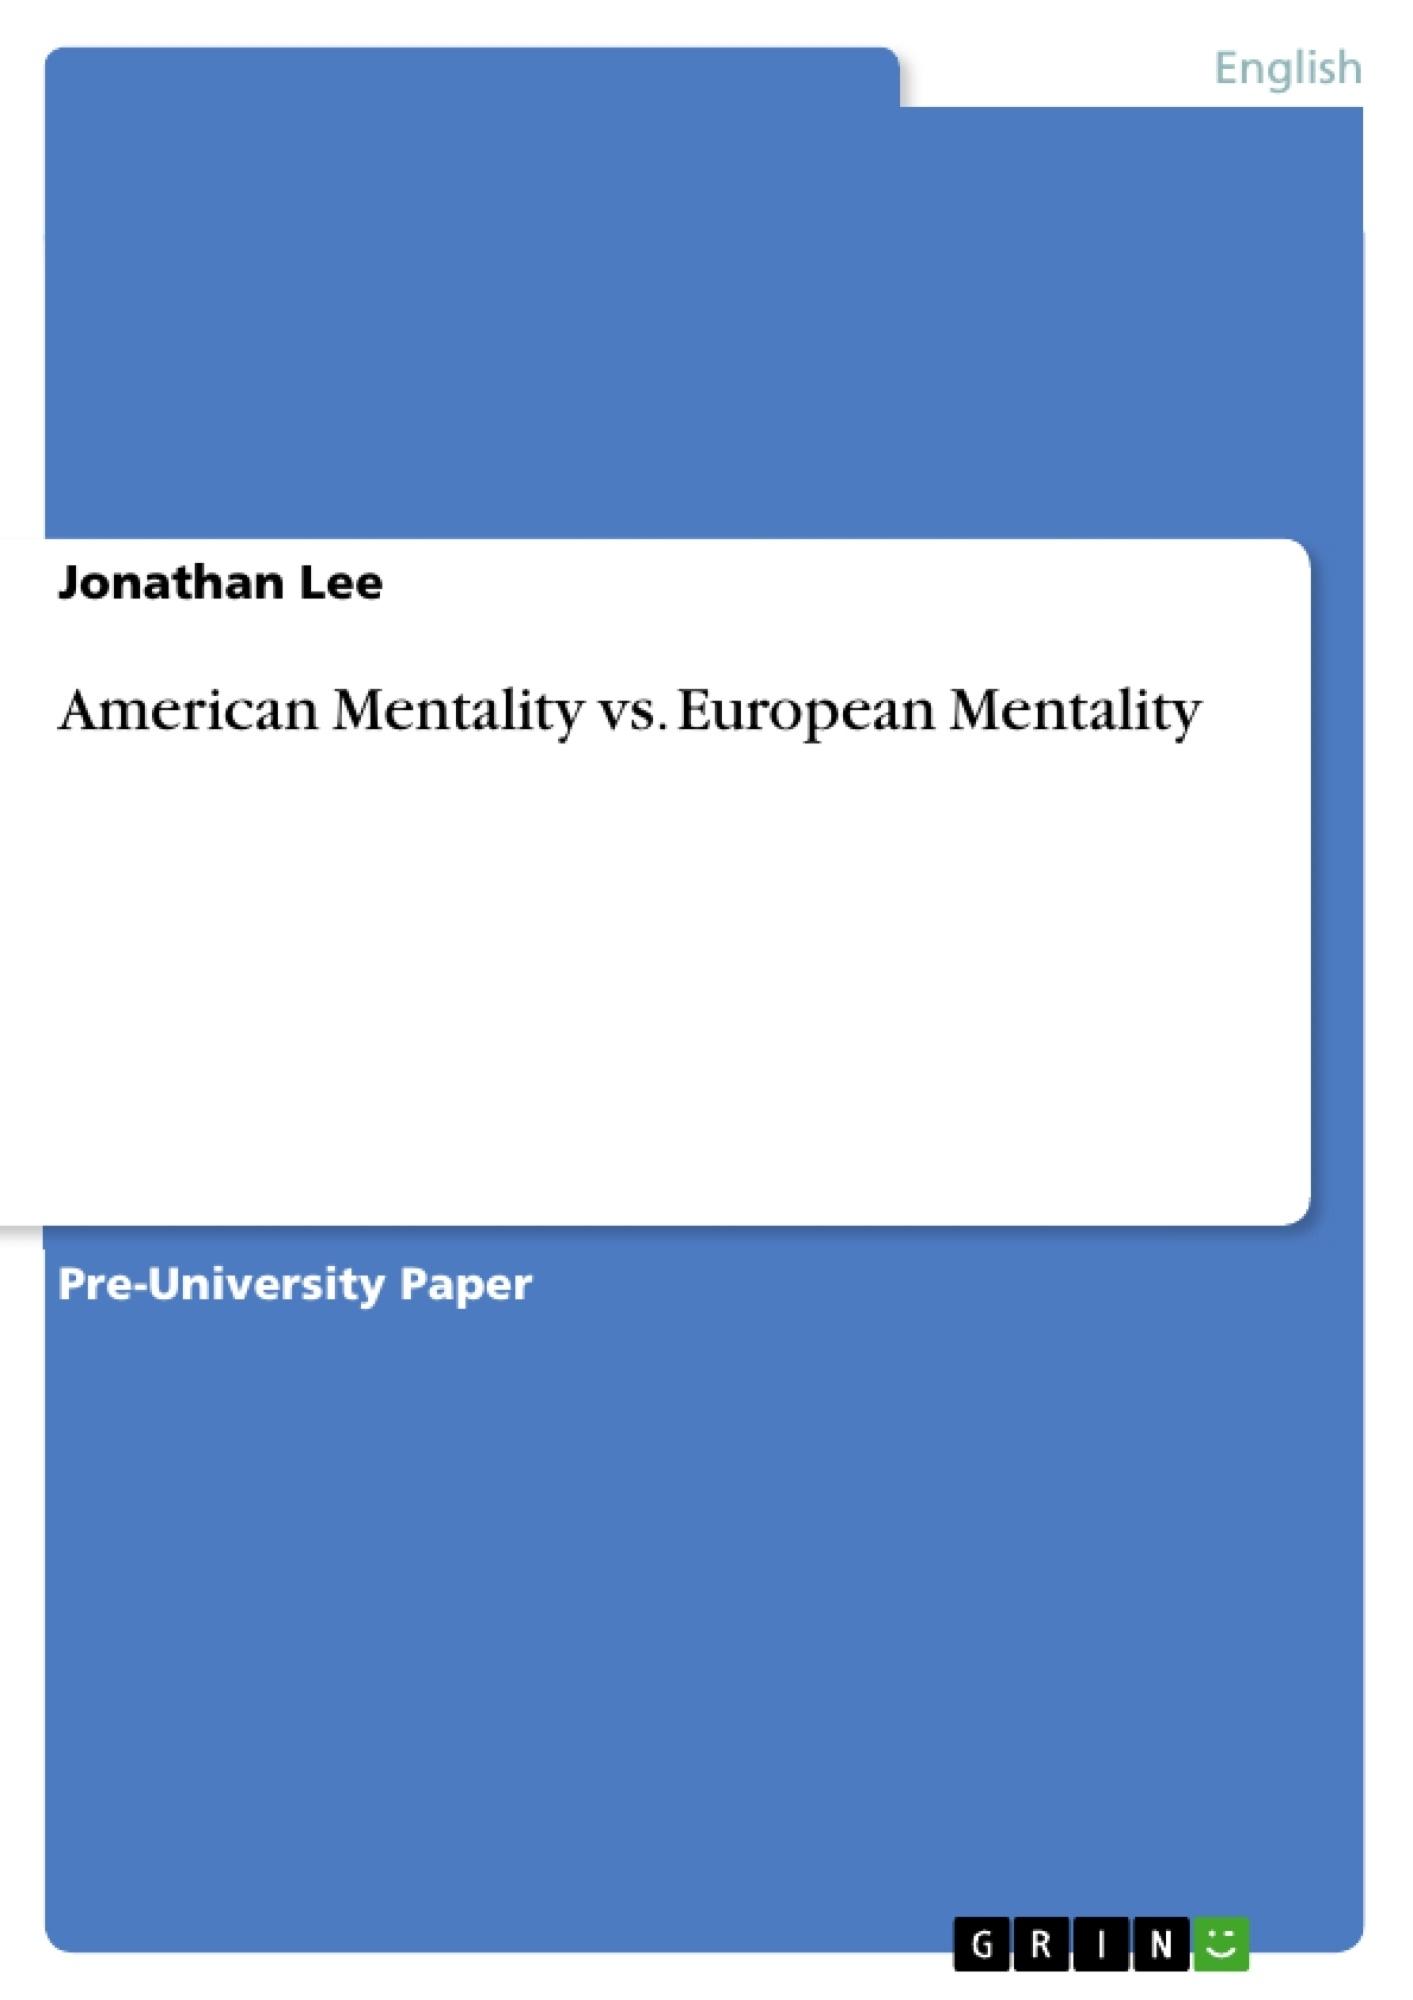 Title: American Mentality vs. European Mentality